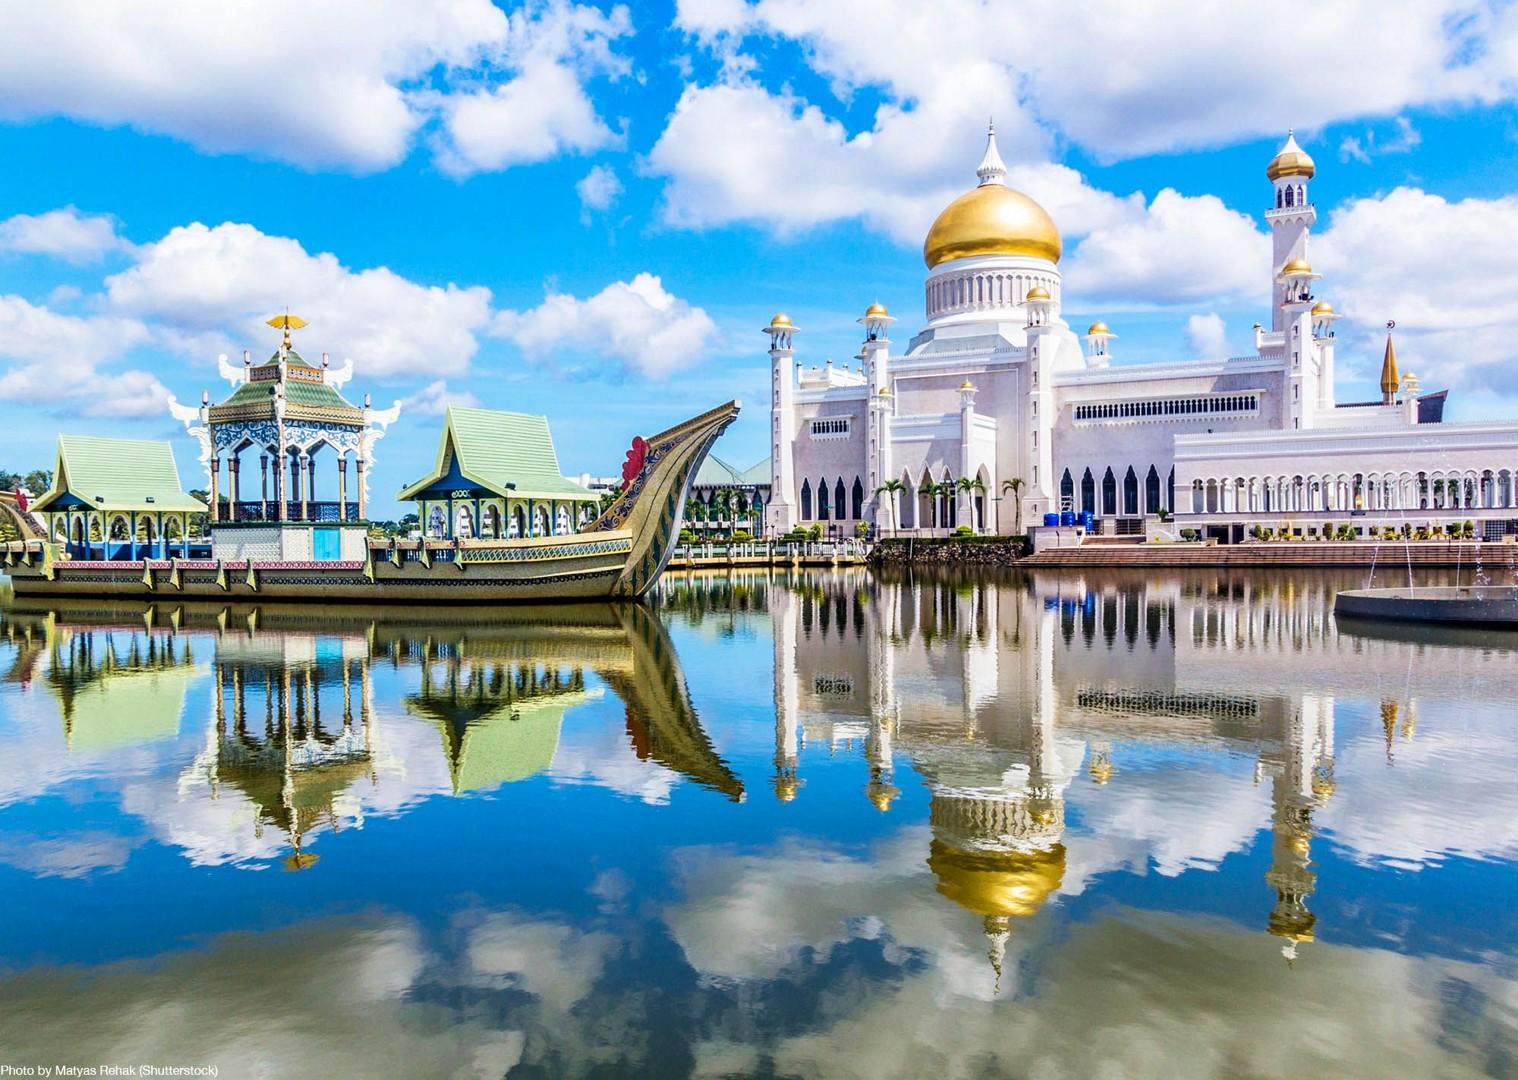 road-cycling-holiday-mosque-long-haul-borneo-saddle-skedaddle.jpg - Borneo - Sarawak to Sabah - Guided Road Cycling Holiday - Road Cycling